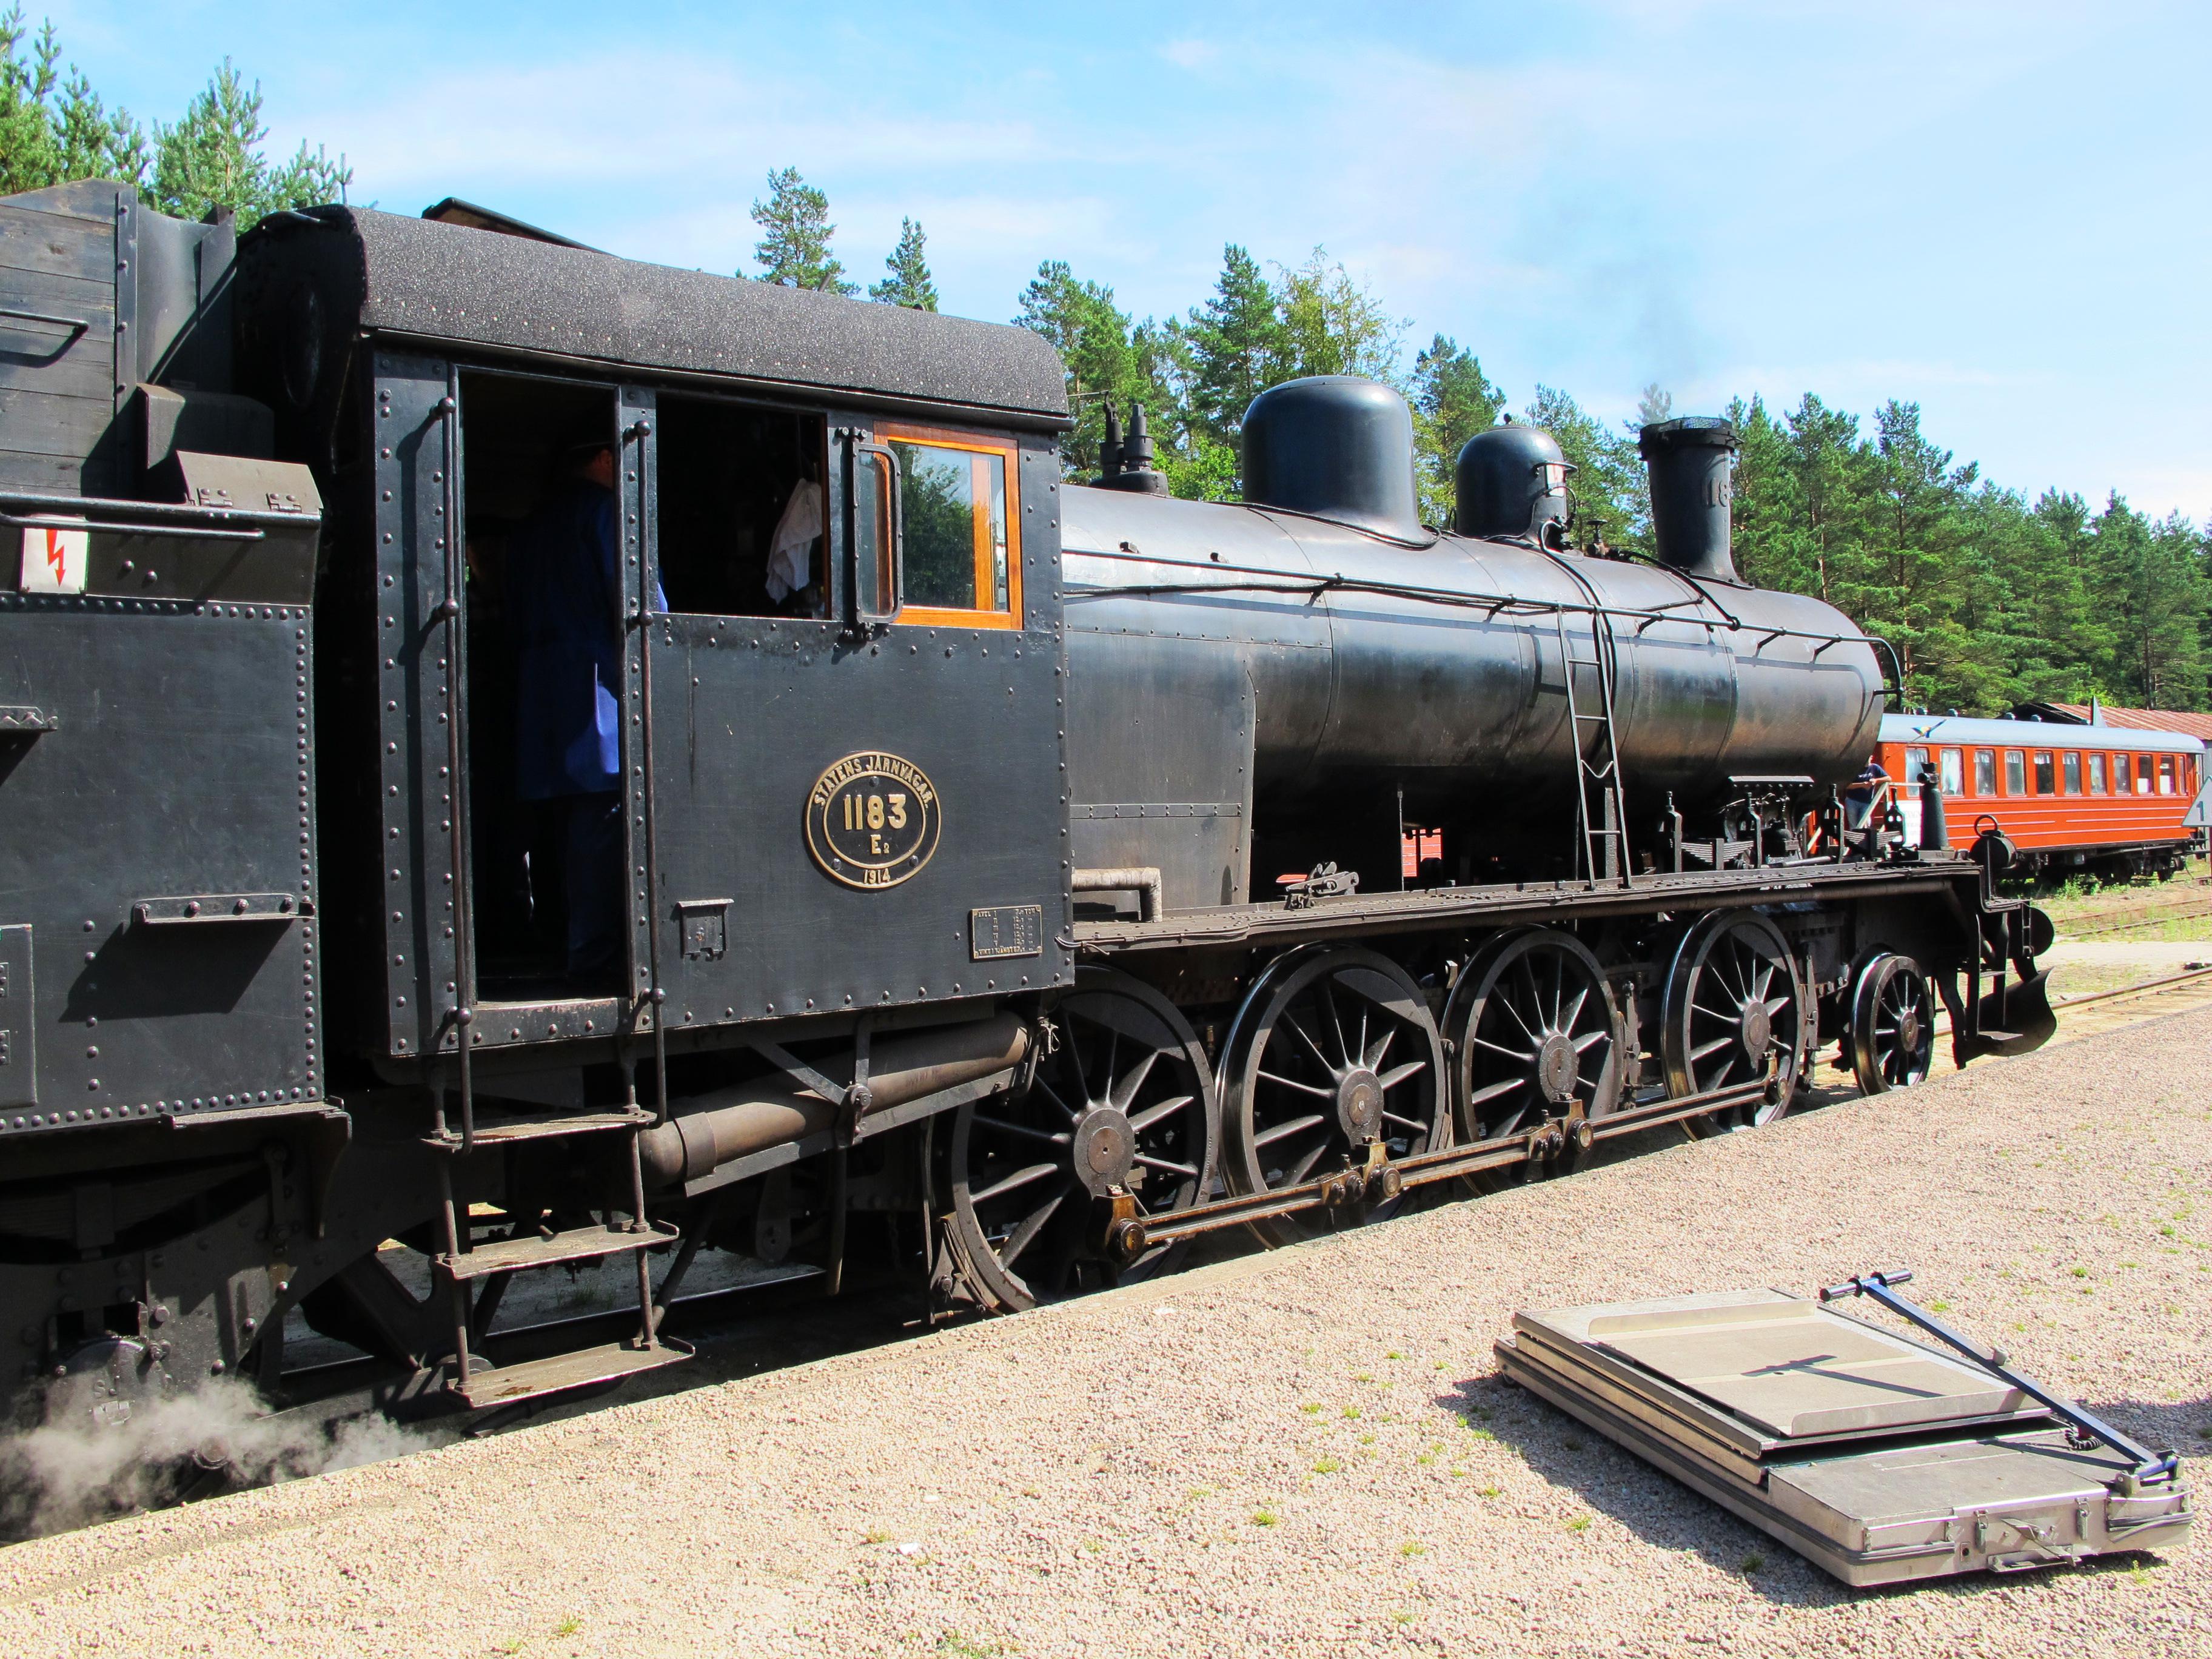 Brösarp steam train (Brösarp Ångtåget) | semiswede